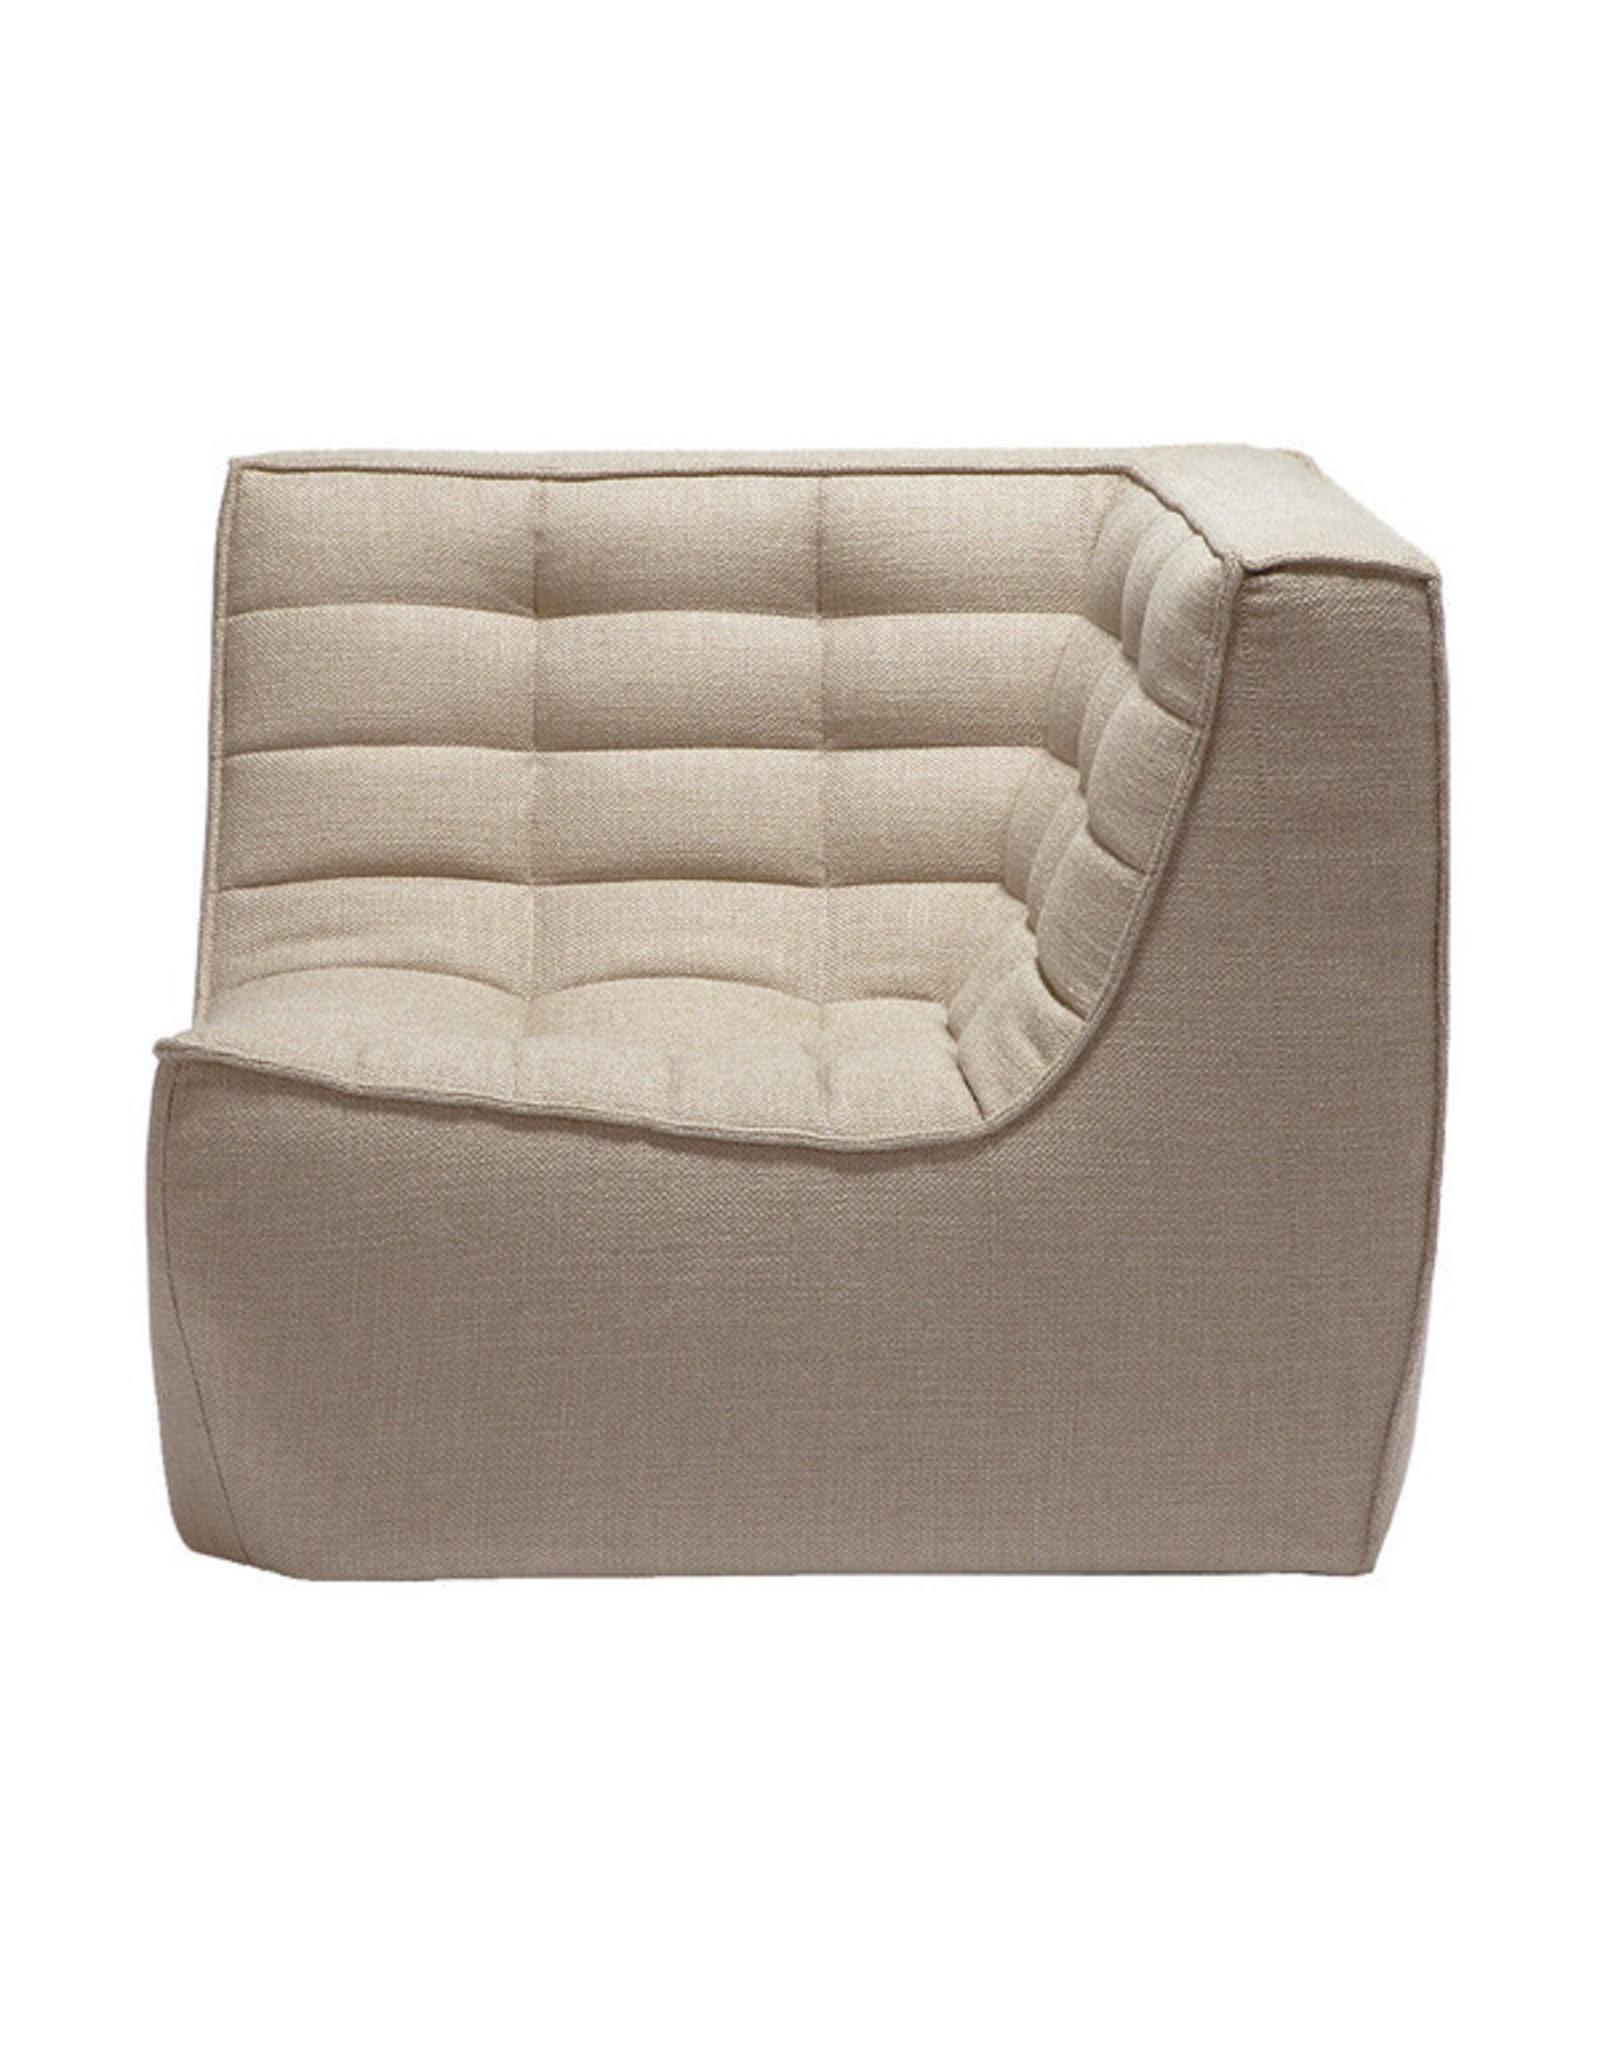 Ethnicraft N701 Sofa Corner - Beige